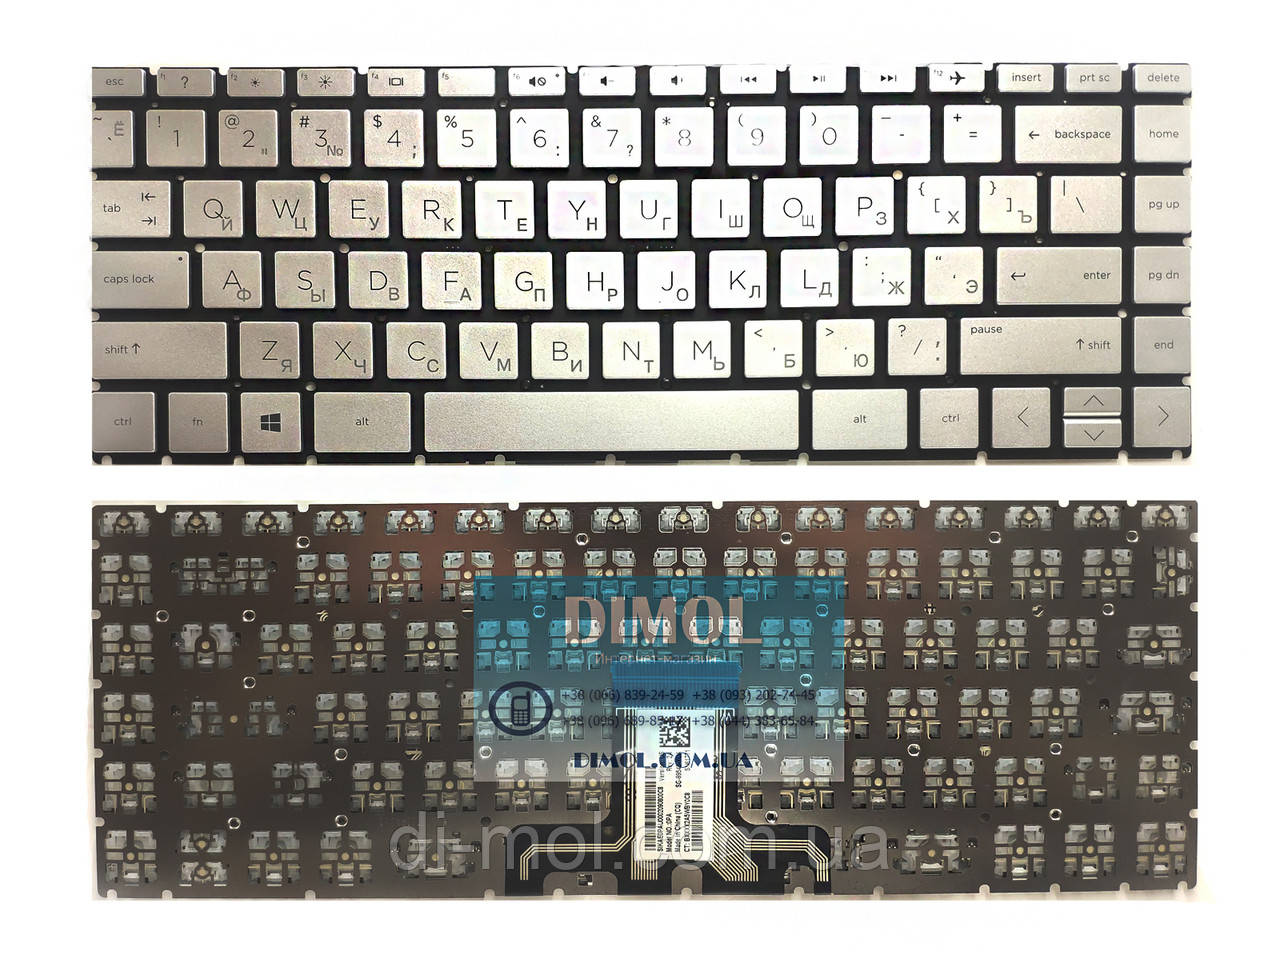 Оригинальная клавиатура для ноутбука HP Pavilion X360 14-CD series, silver, rus